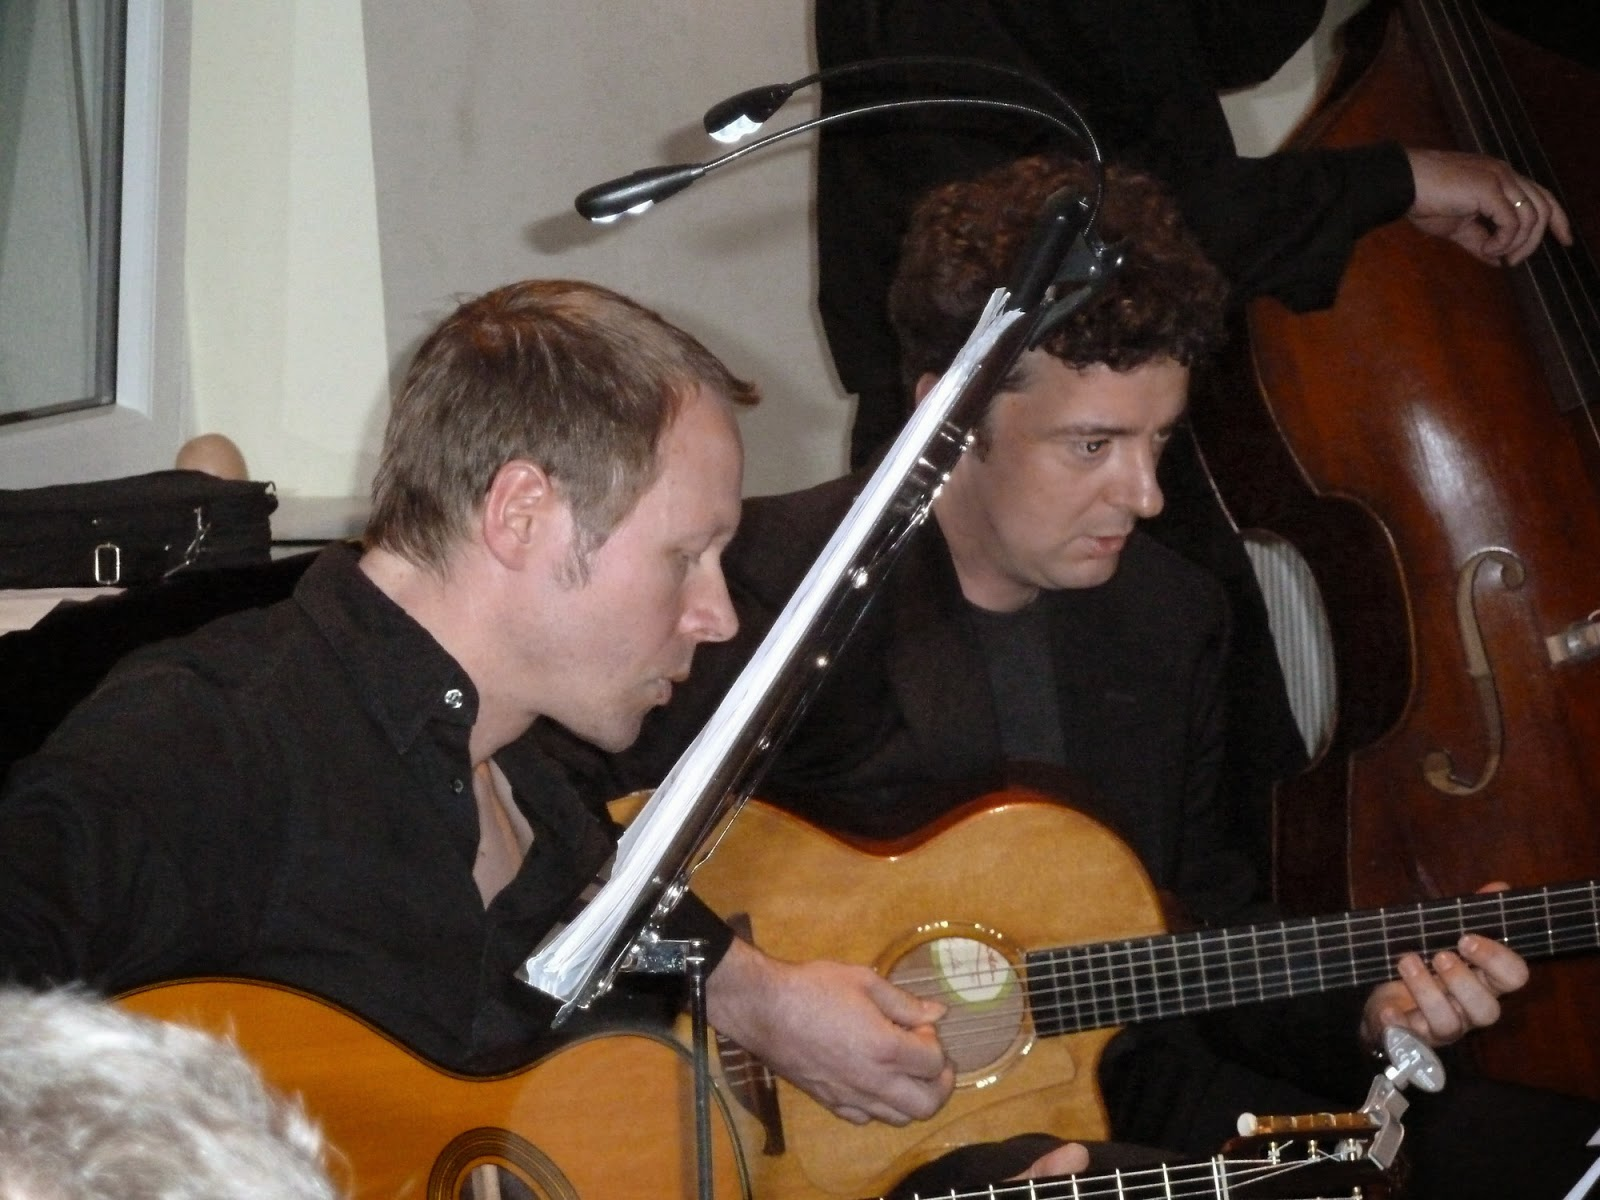 Frank Olaf Nagel und Thomas Monnerjahn